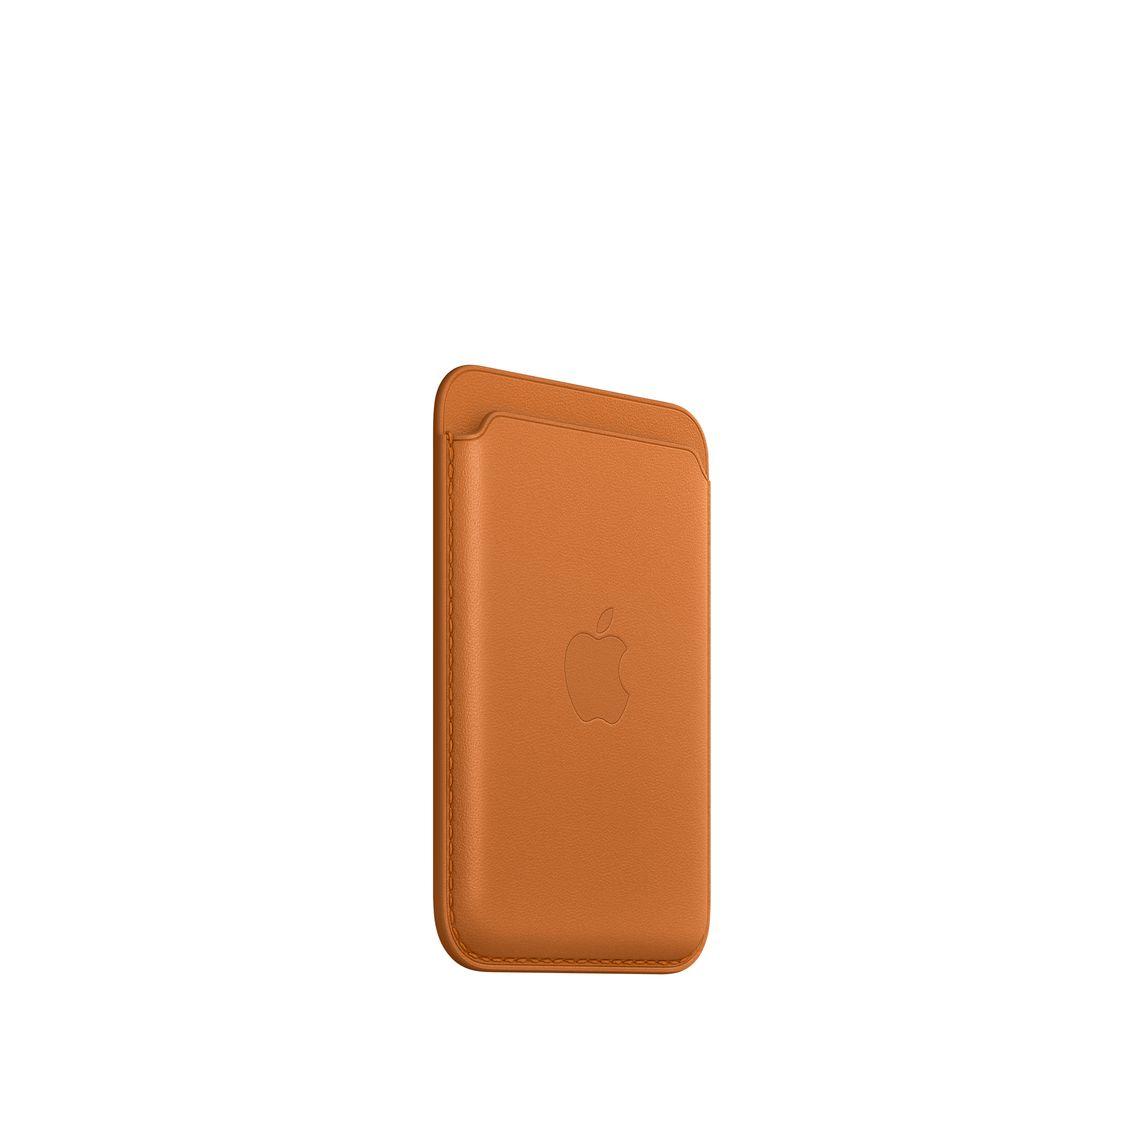 iPhone Leder Wallet mit MagSafe - Goldbraun